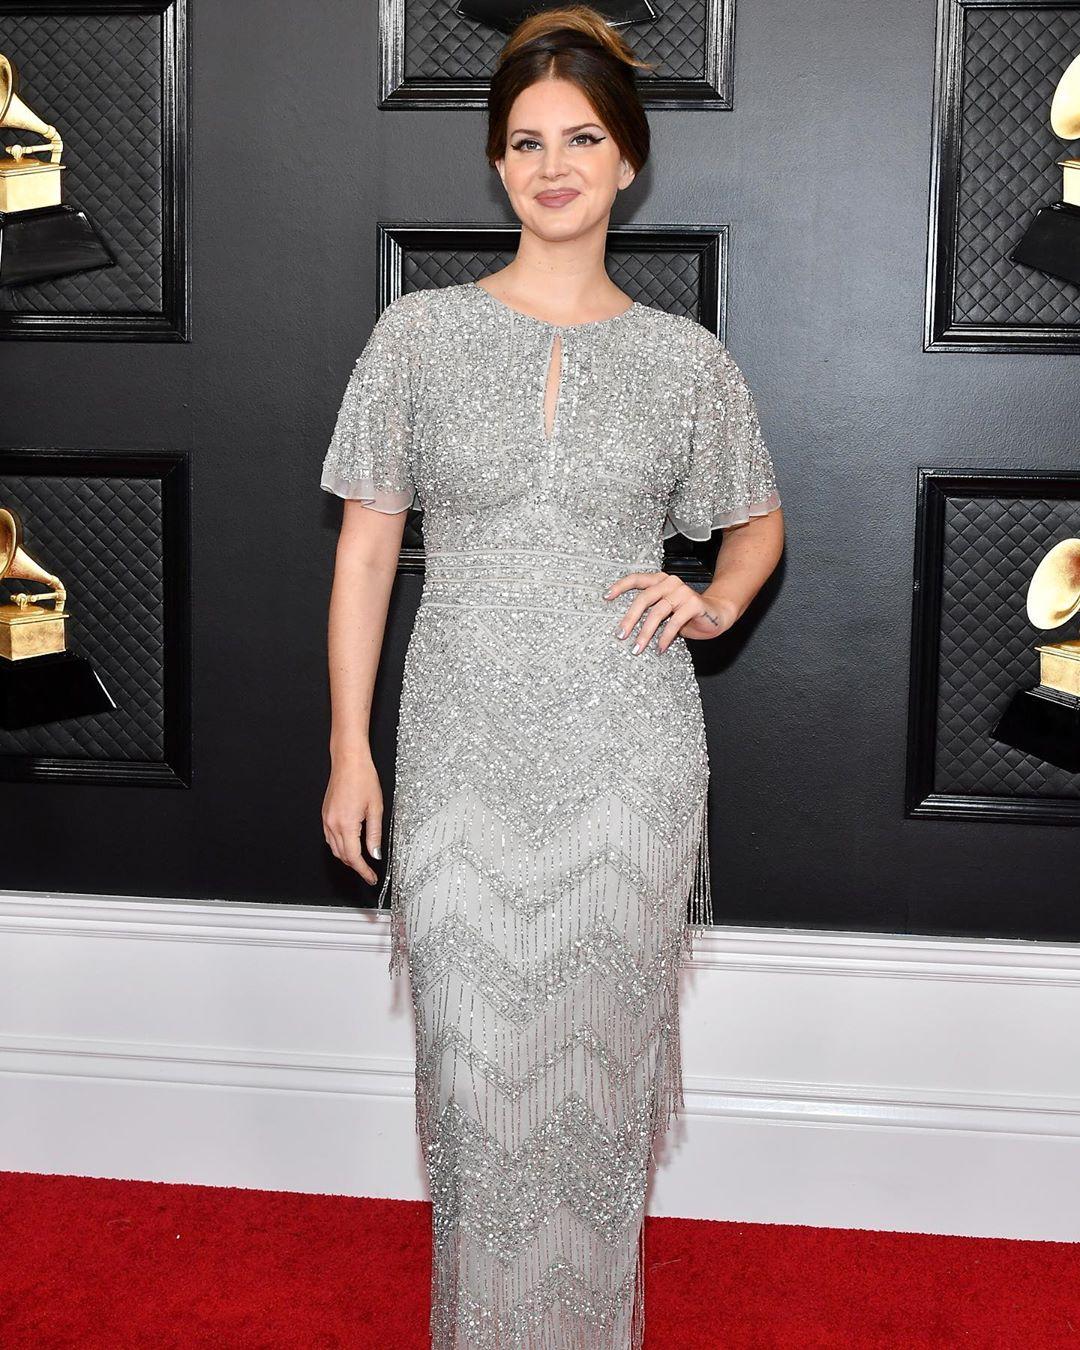 Lana Del Ray at the red carpet